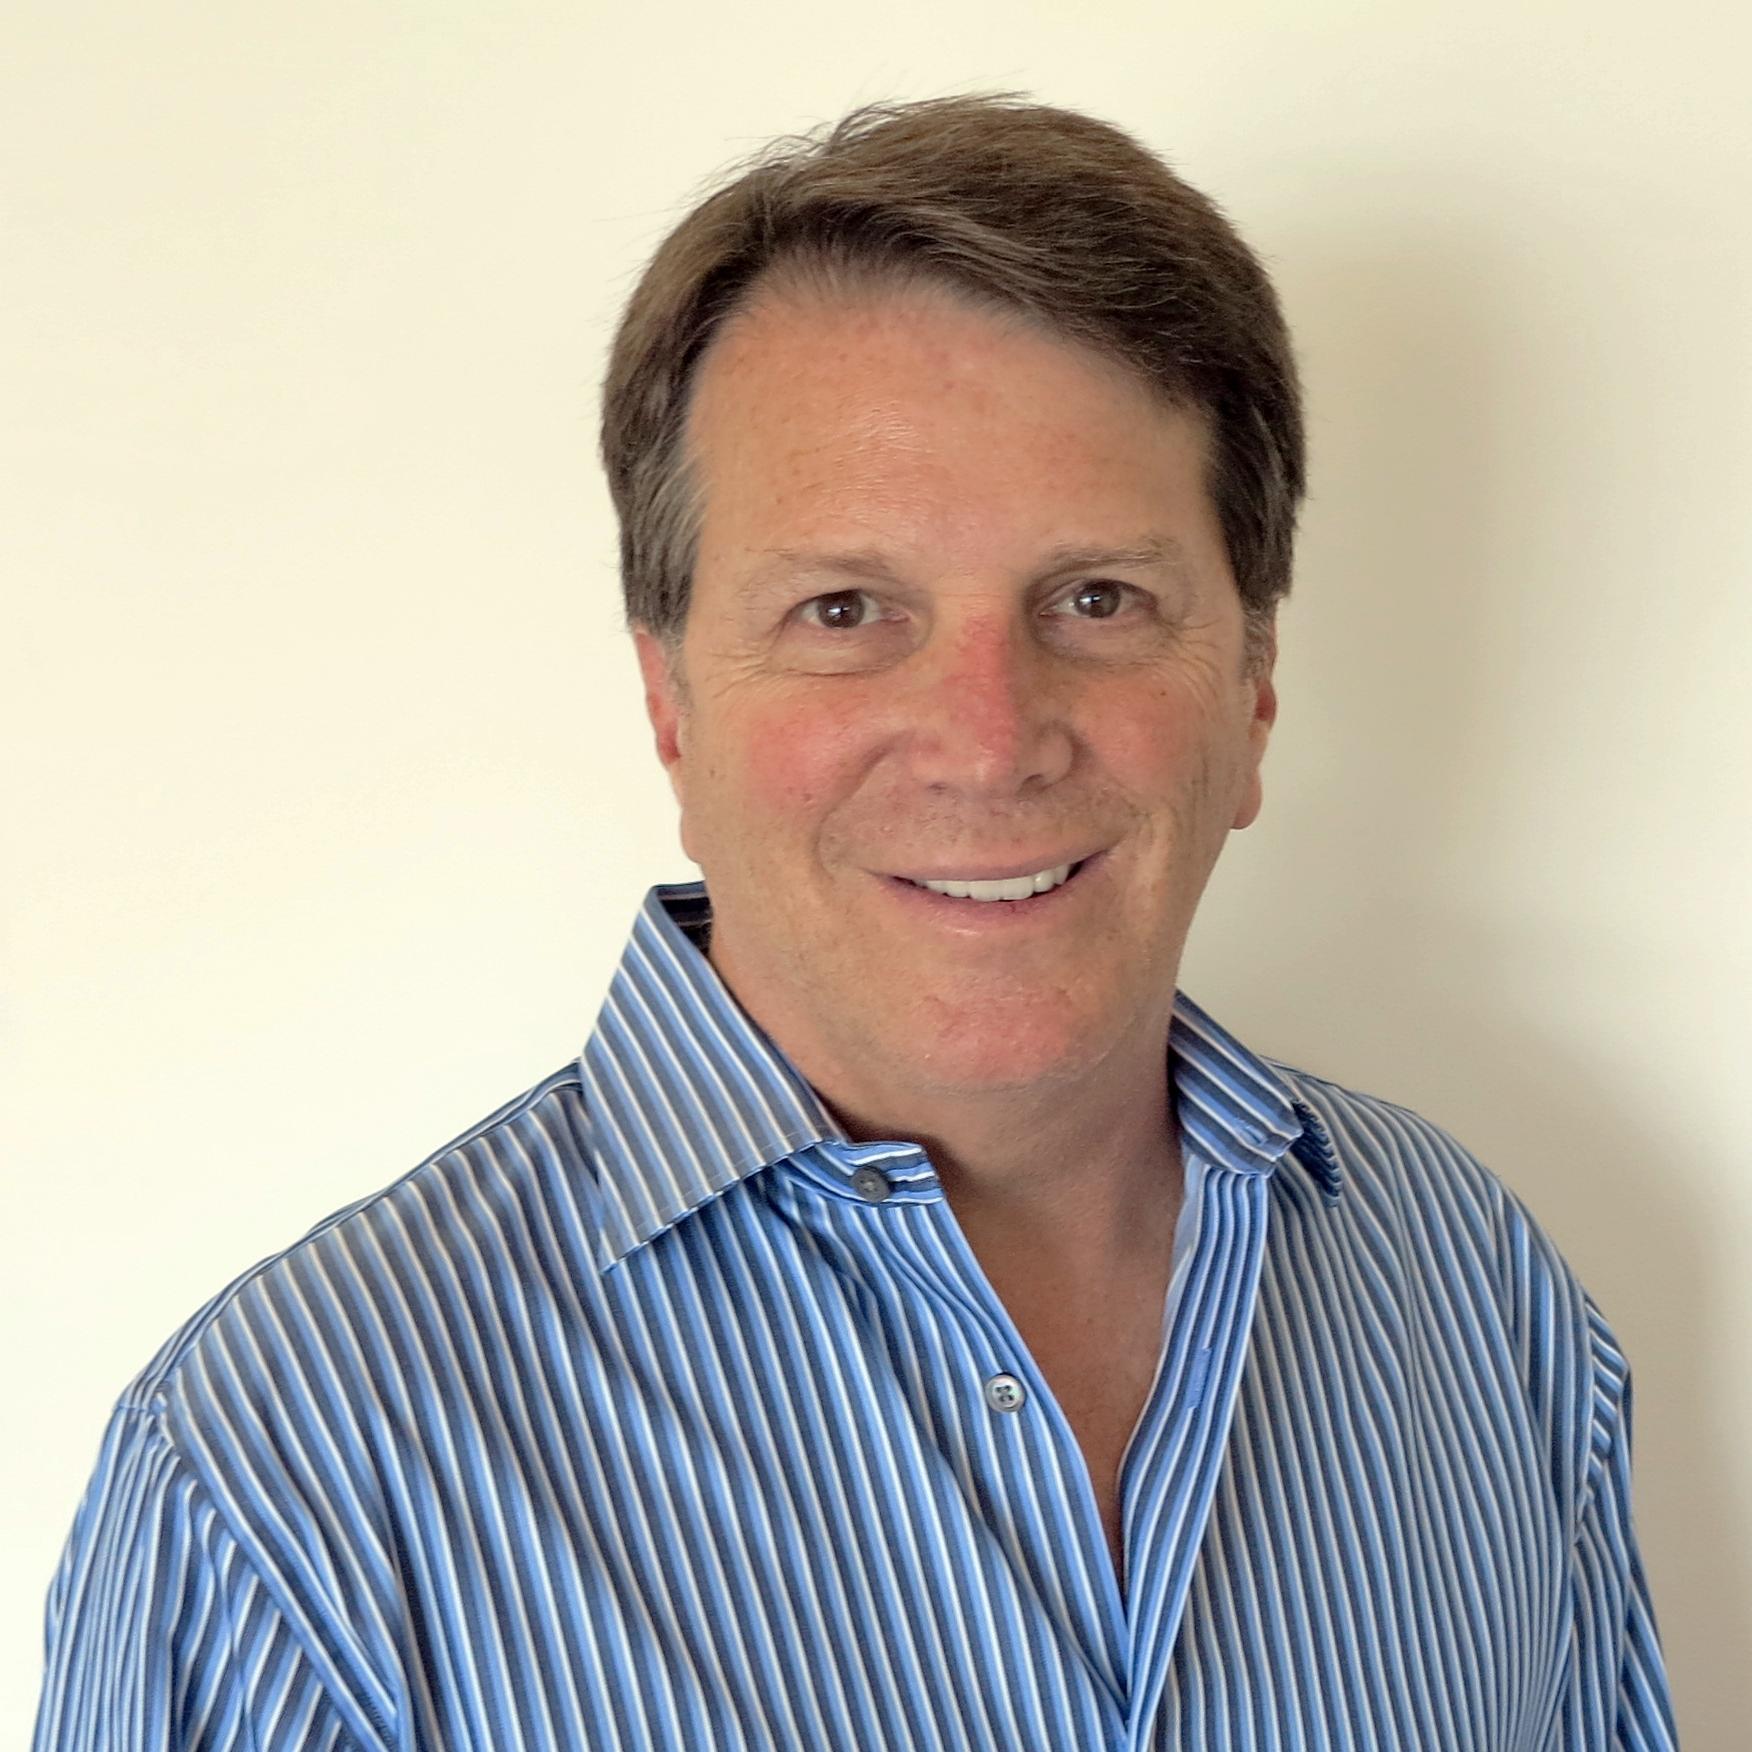 Mark Lampert - Mentor & Engineer